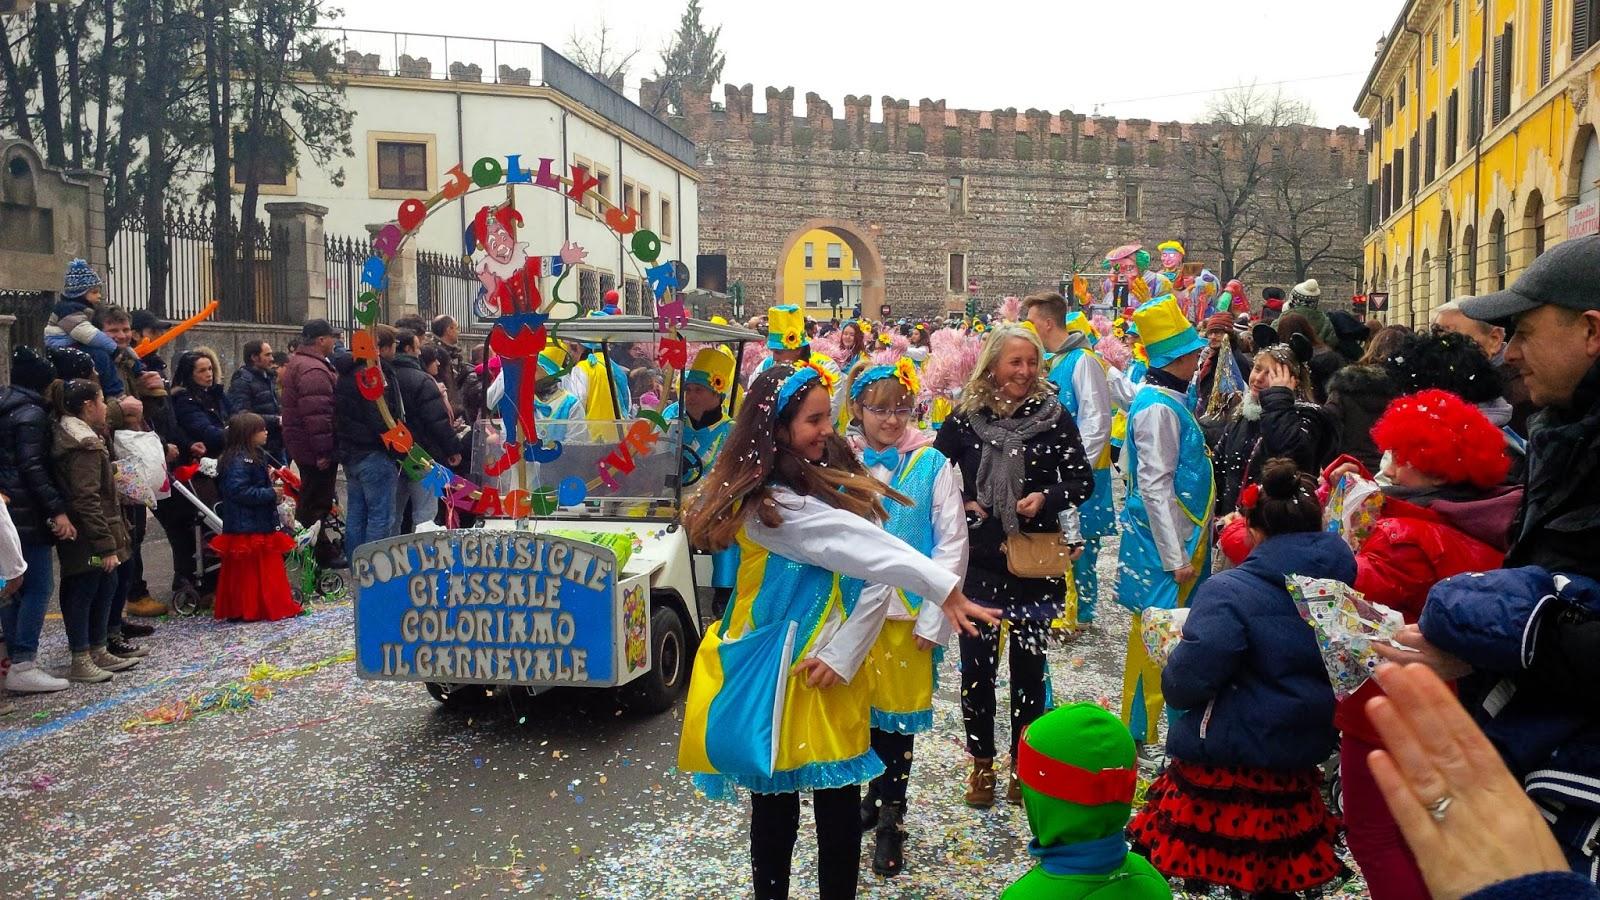 Throwing confetti - Verona Carnival